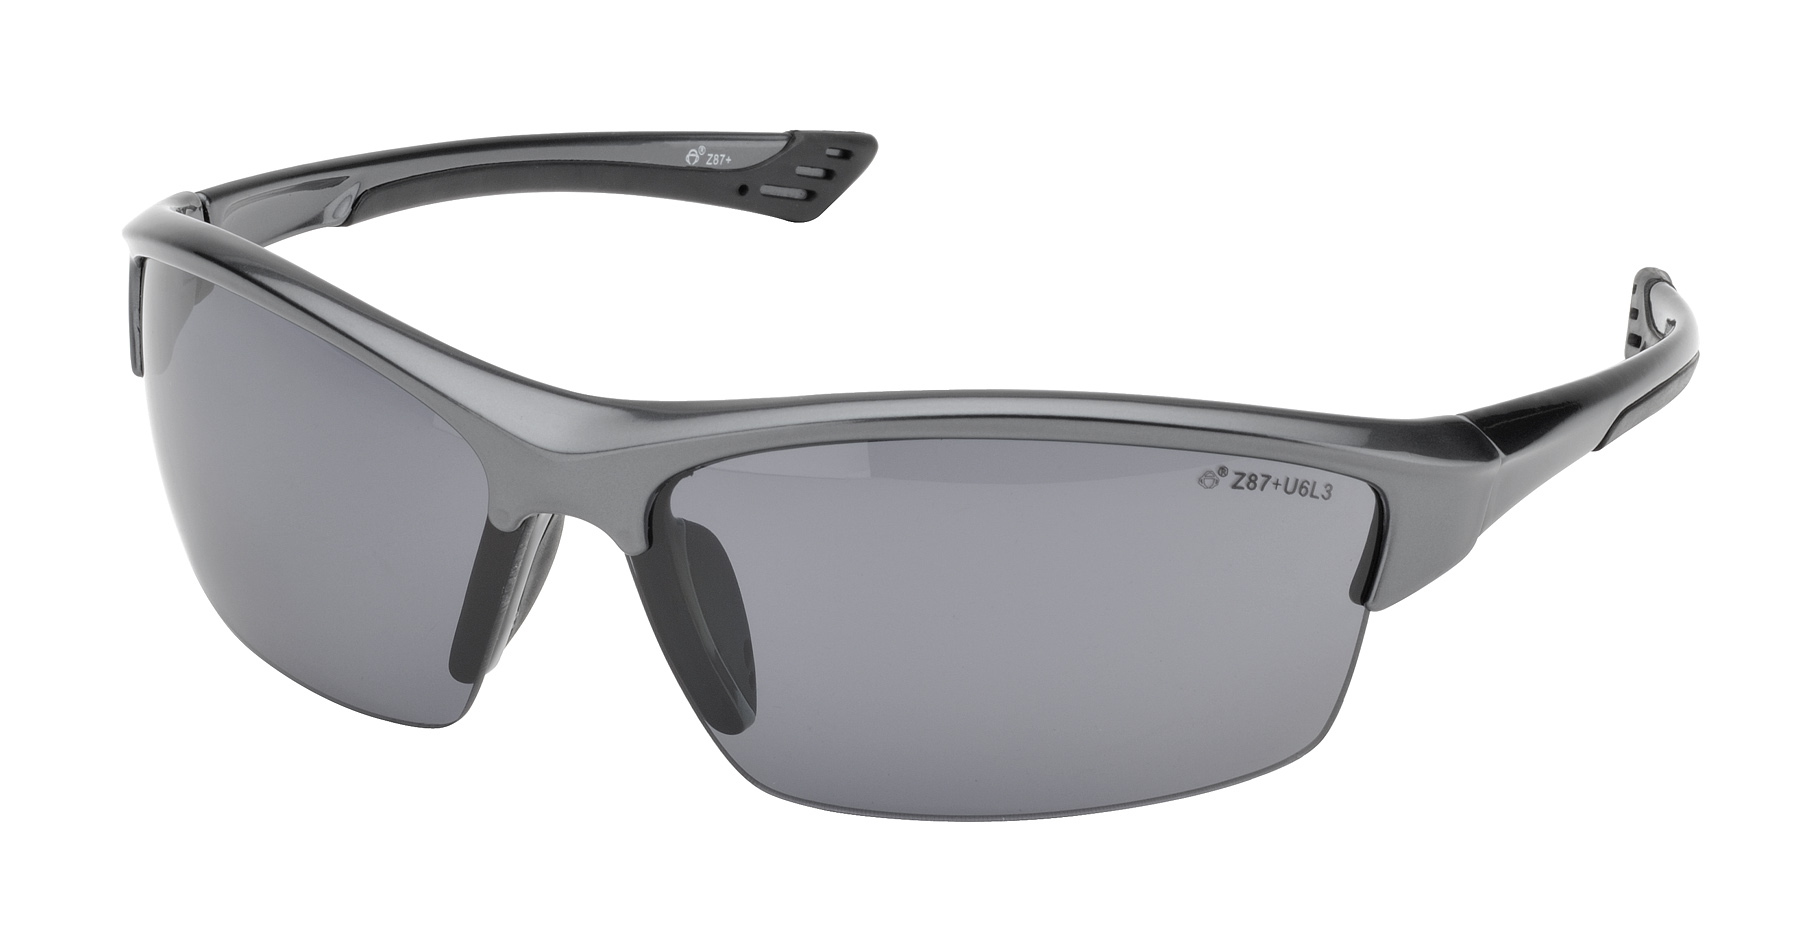 Elvex Sonoma™ Safety Glasses, SG-350